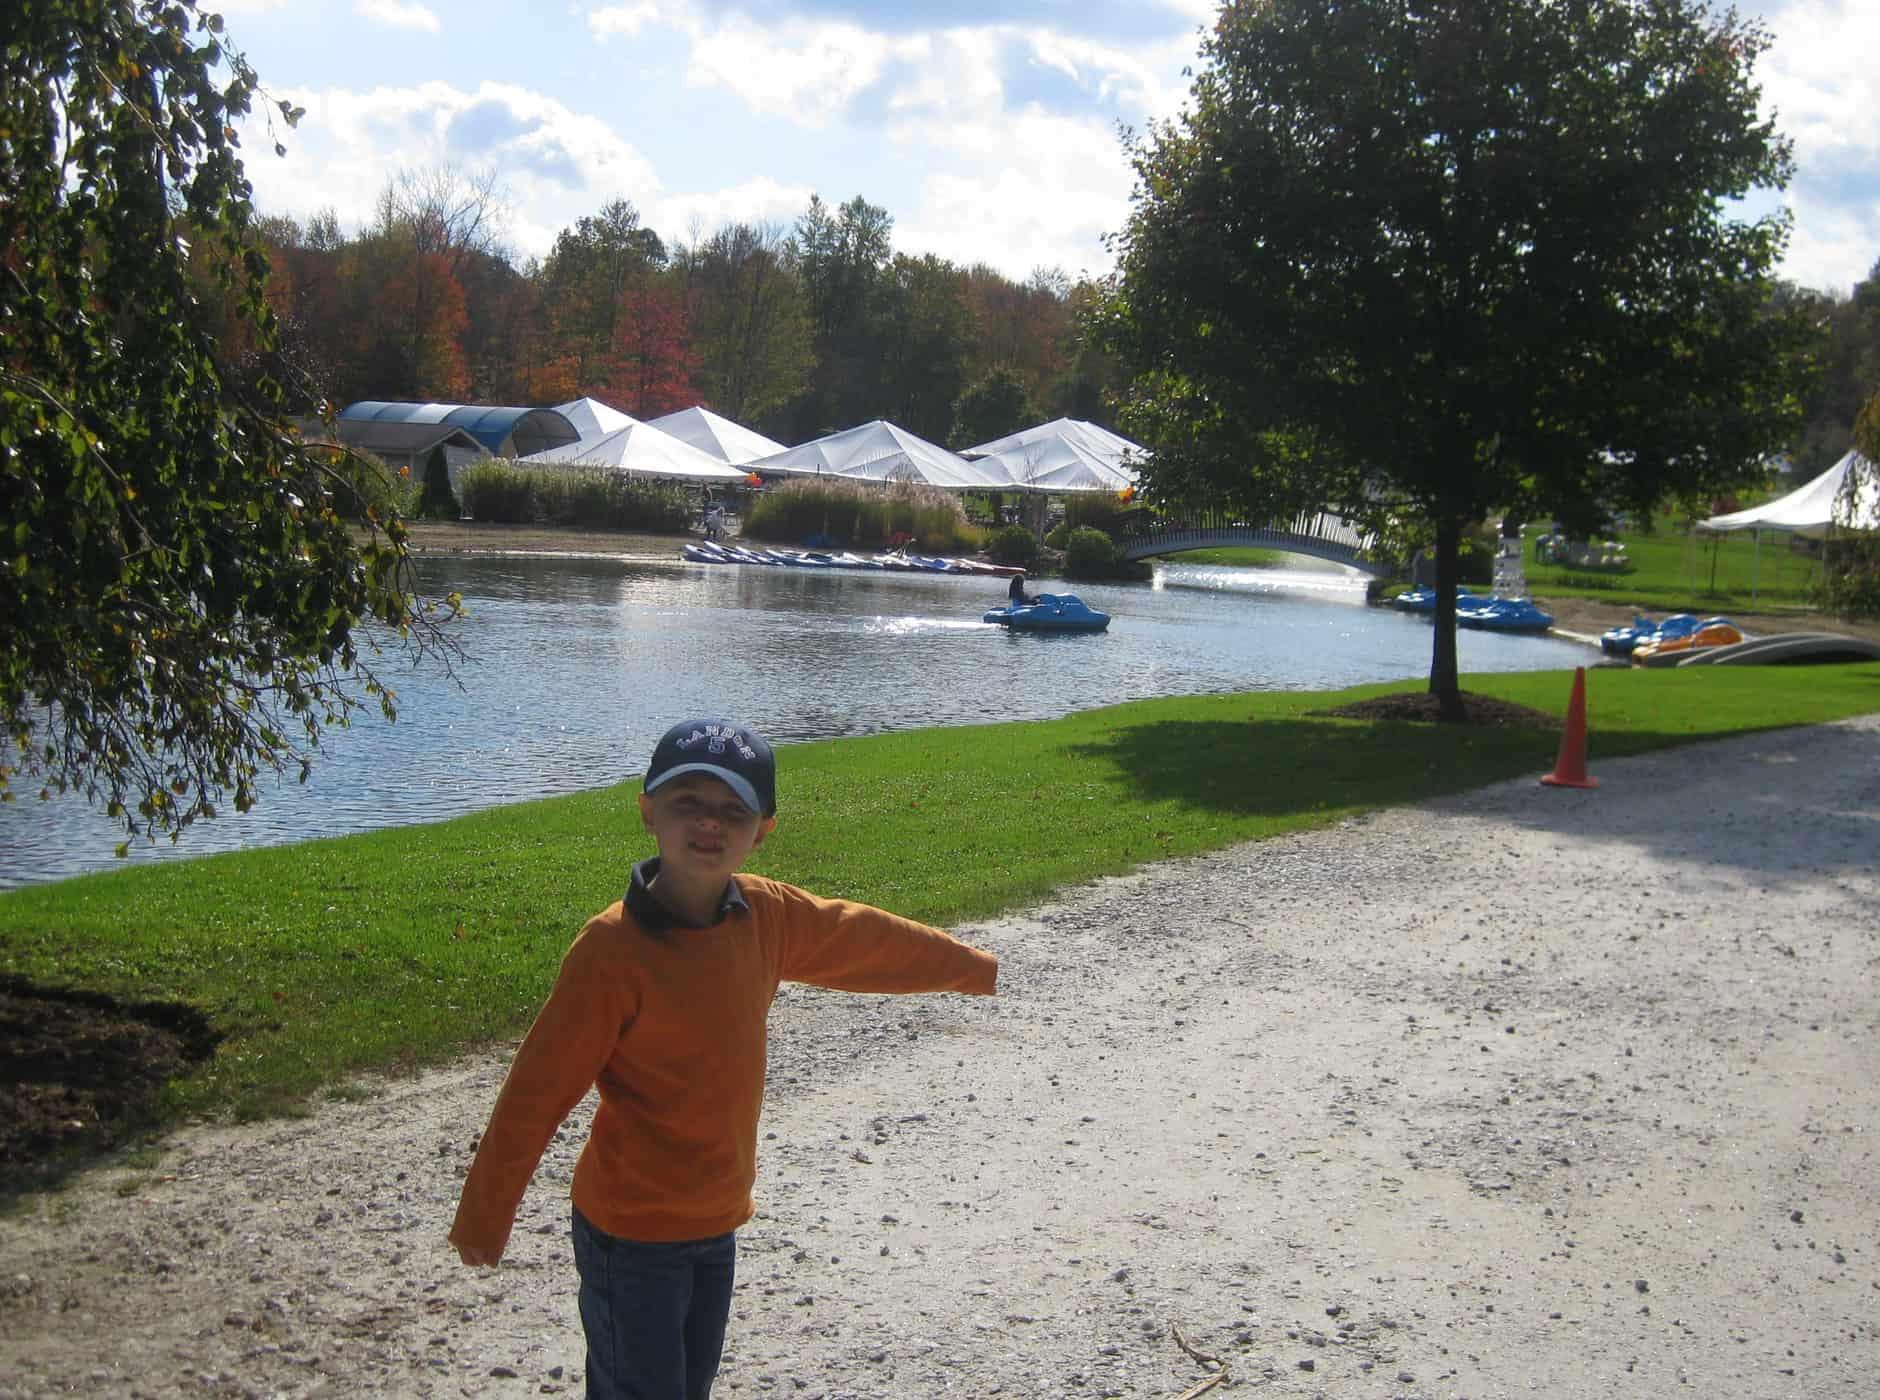 Fall Fair and Pedal Boat Fun